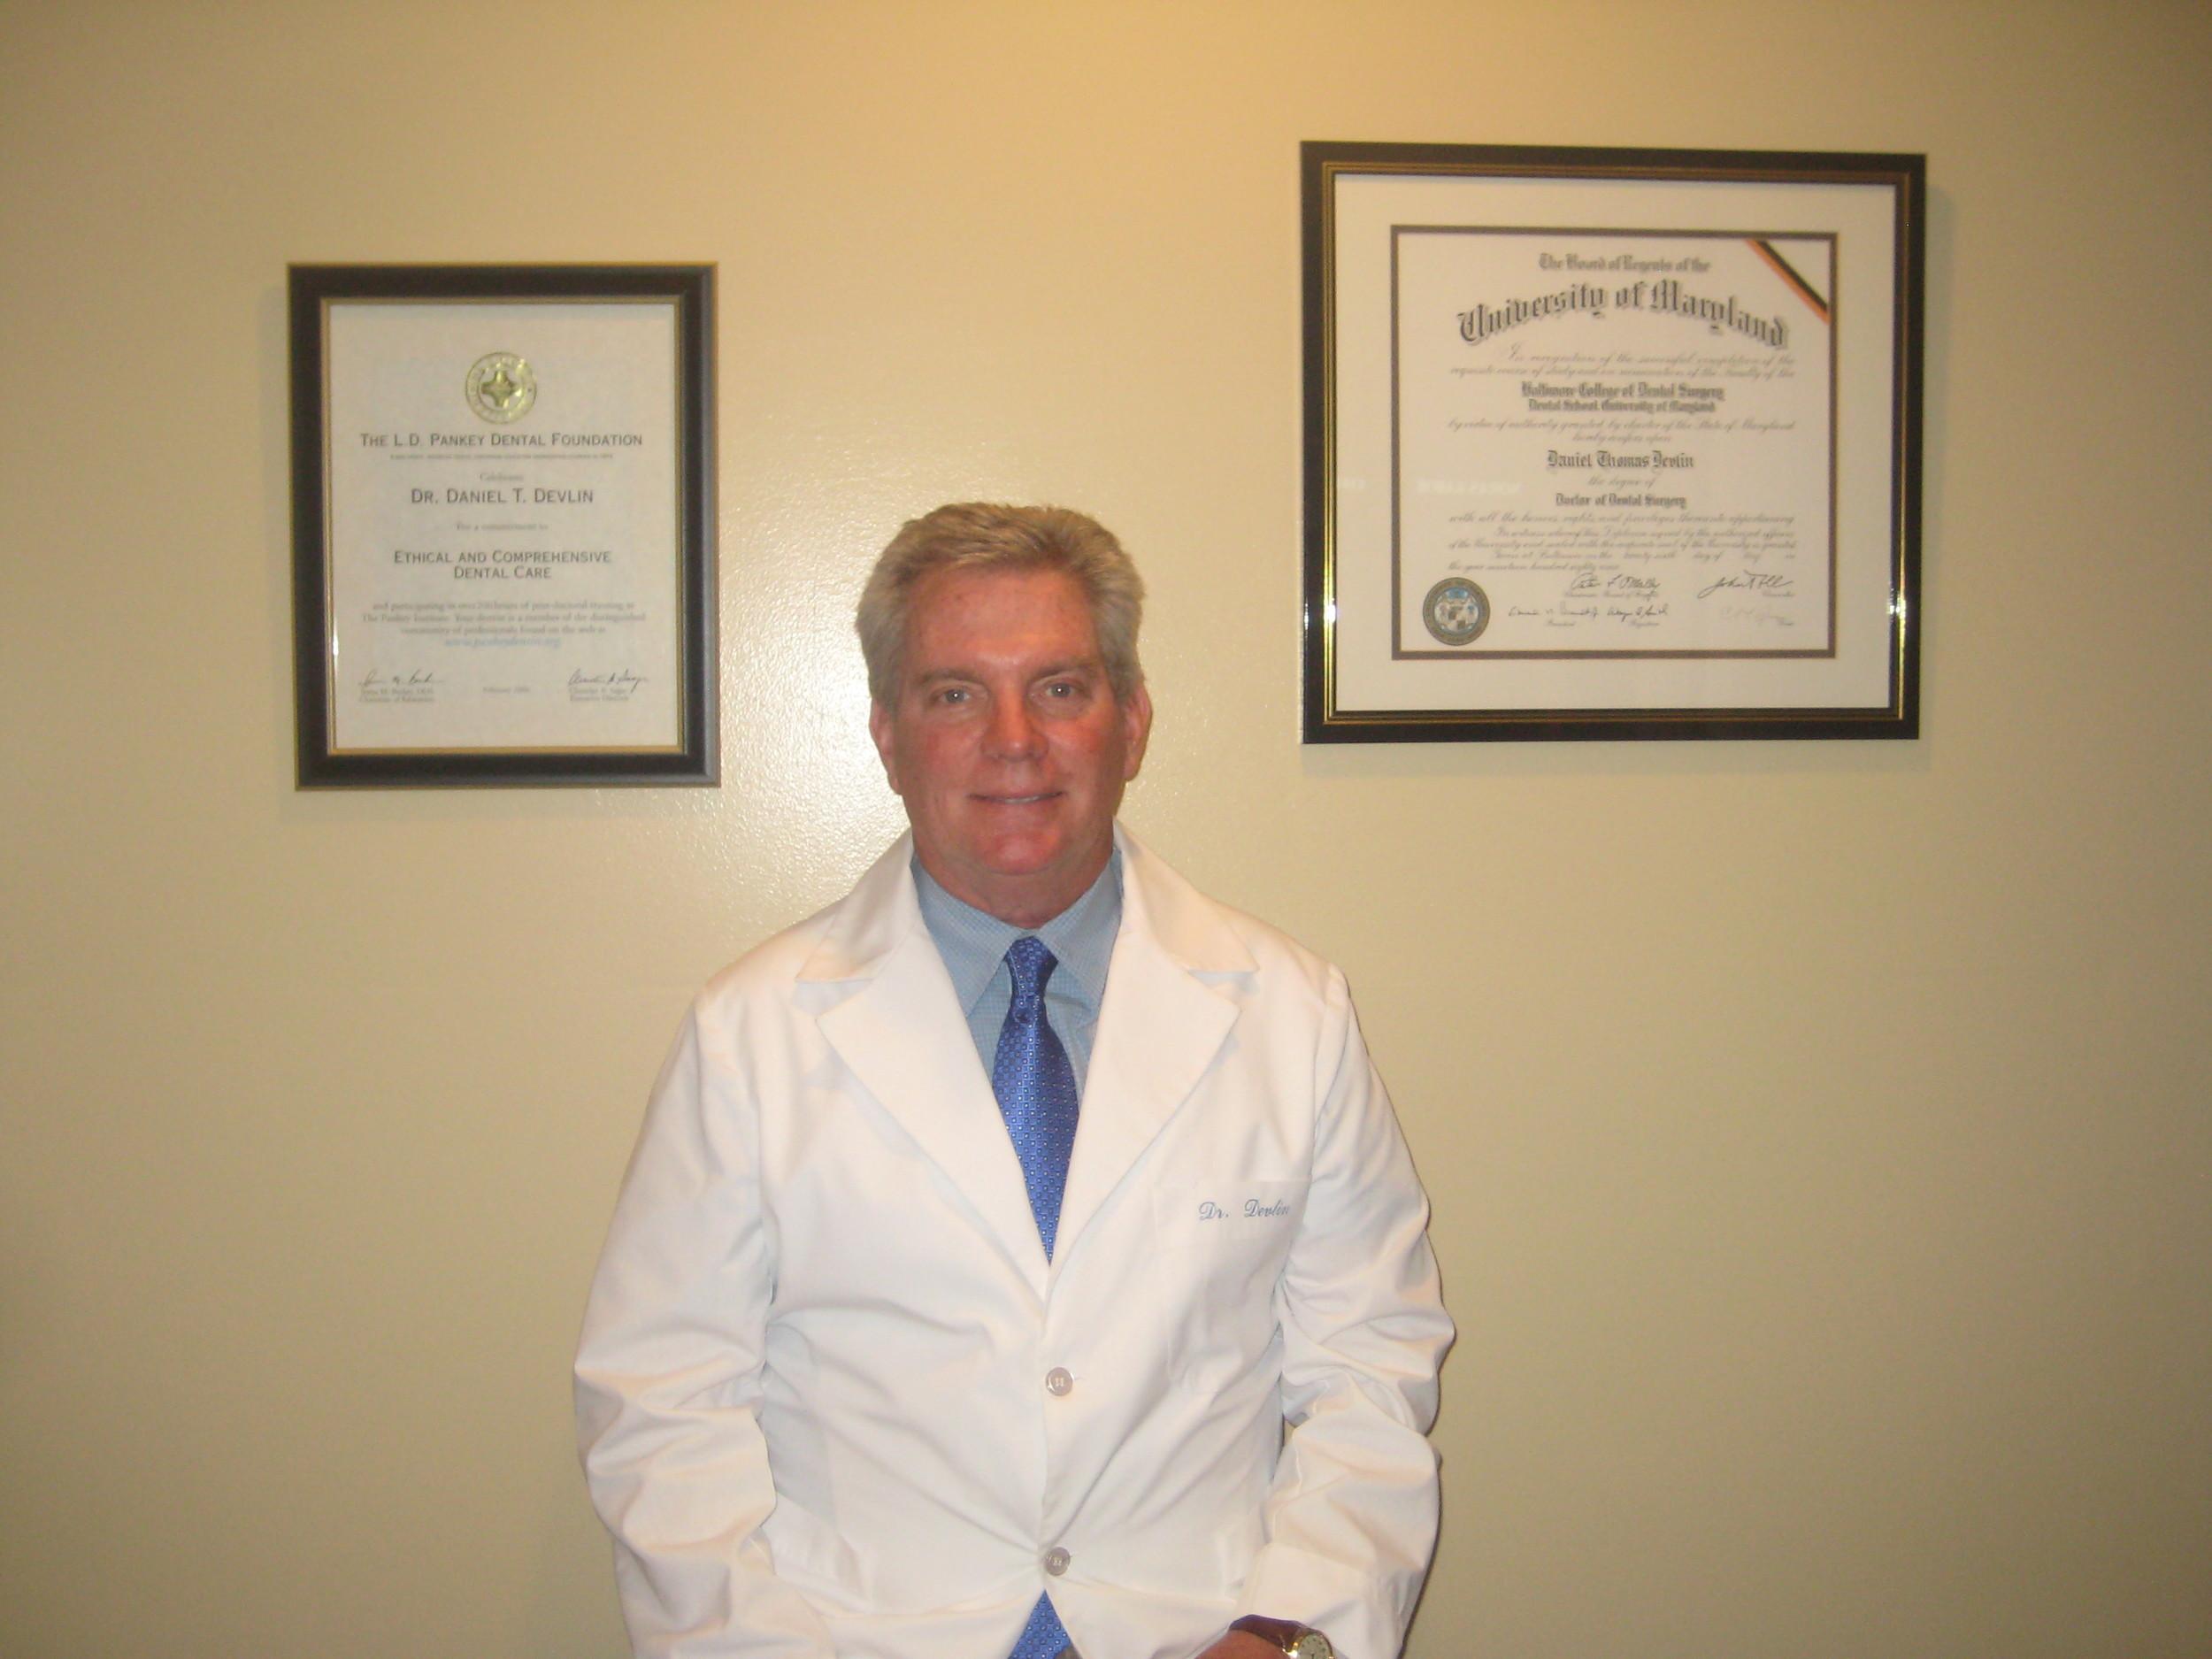 Dr. Daniel Devlin